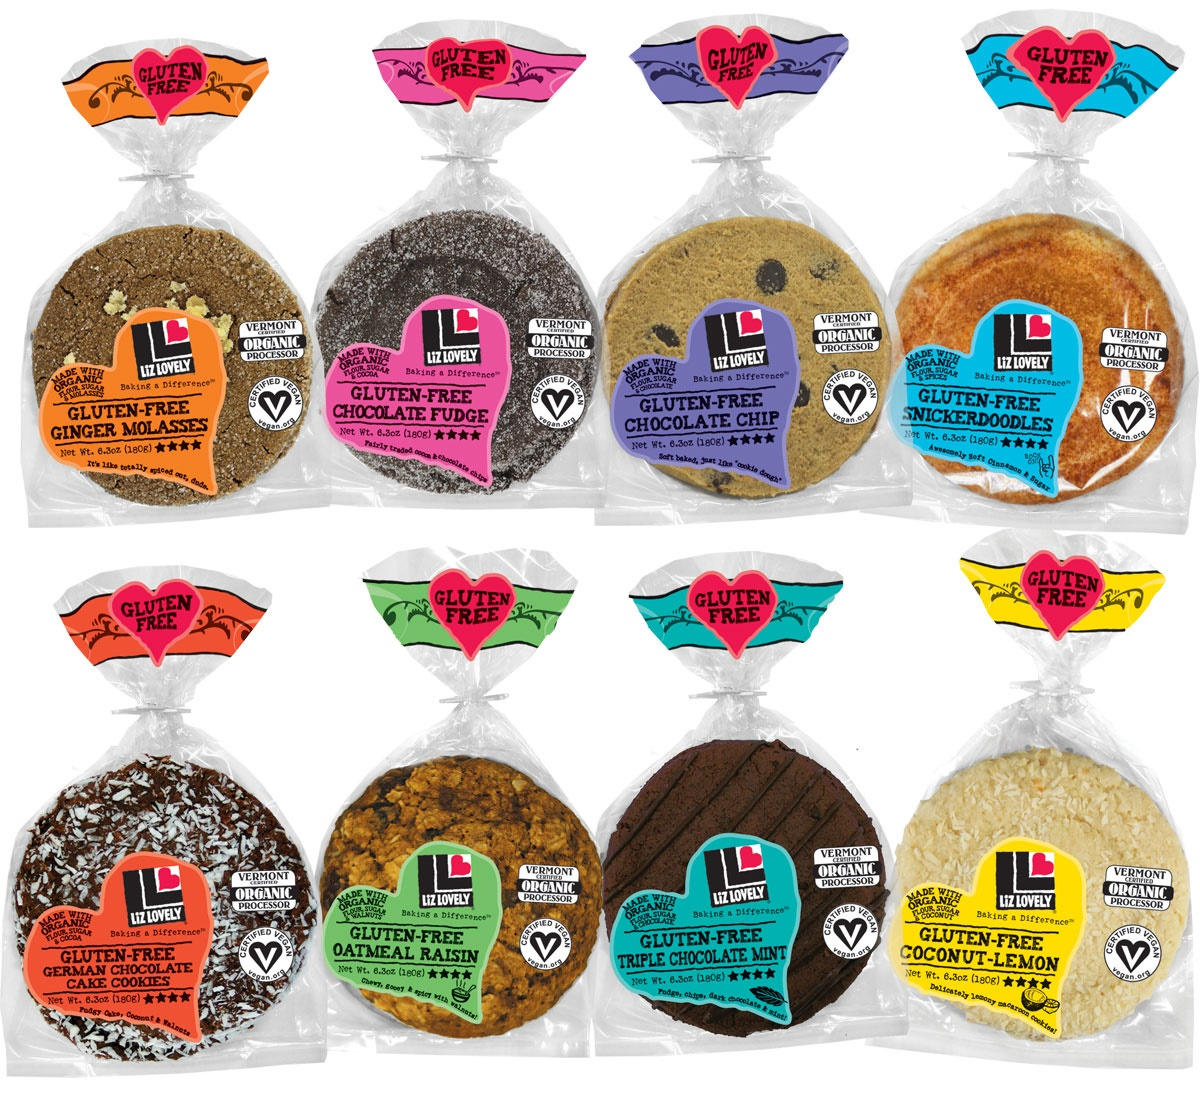 Liz Lovely Gluten Free Cookies - Vegan, Kosher Parve BIG Soft Cookies (Review)